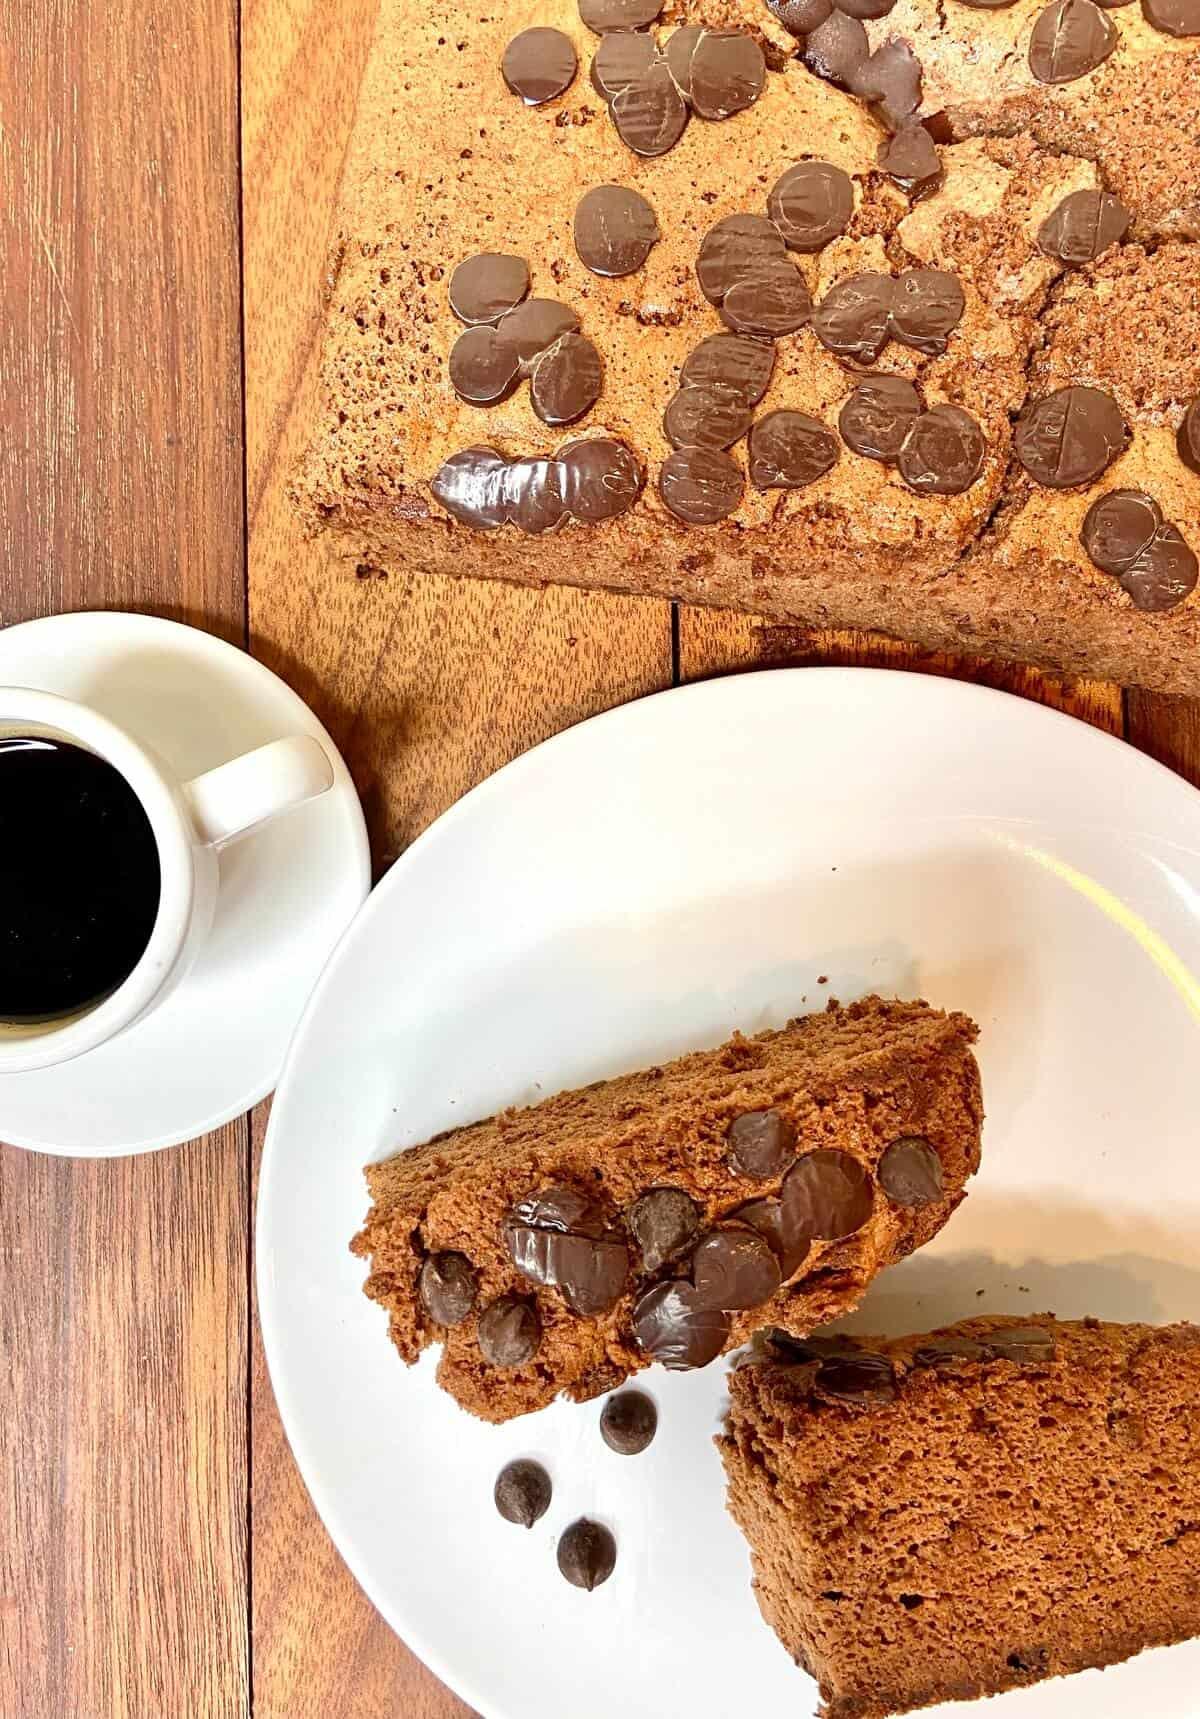 Chocolate Castella Cake (Photo by Erich Boenzli)